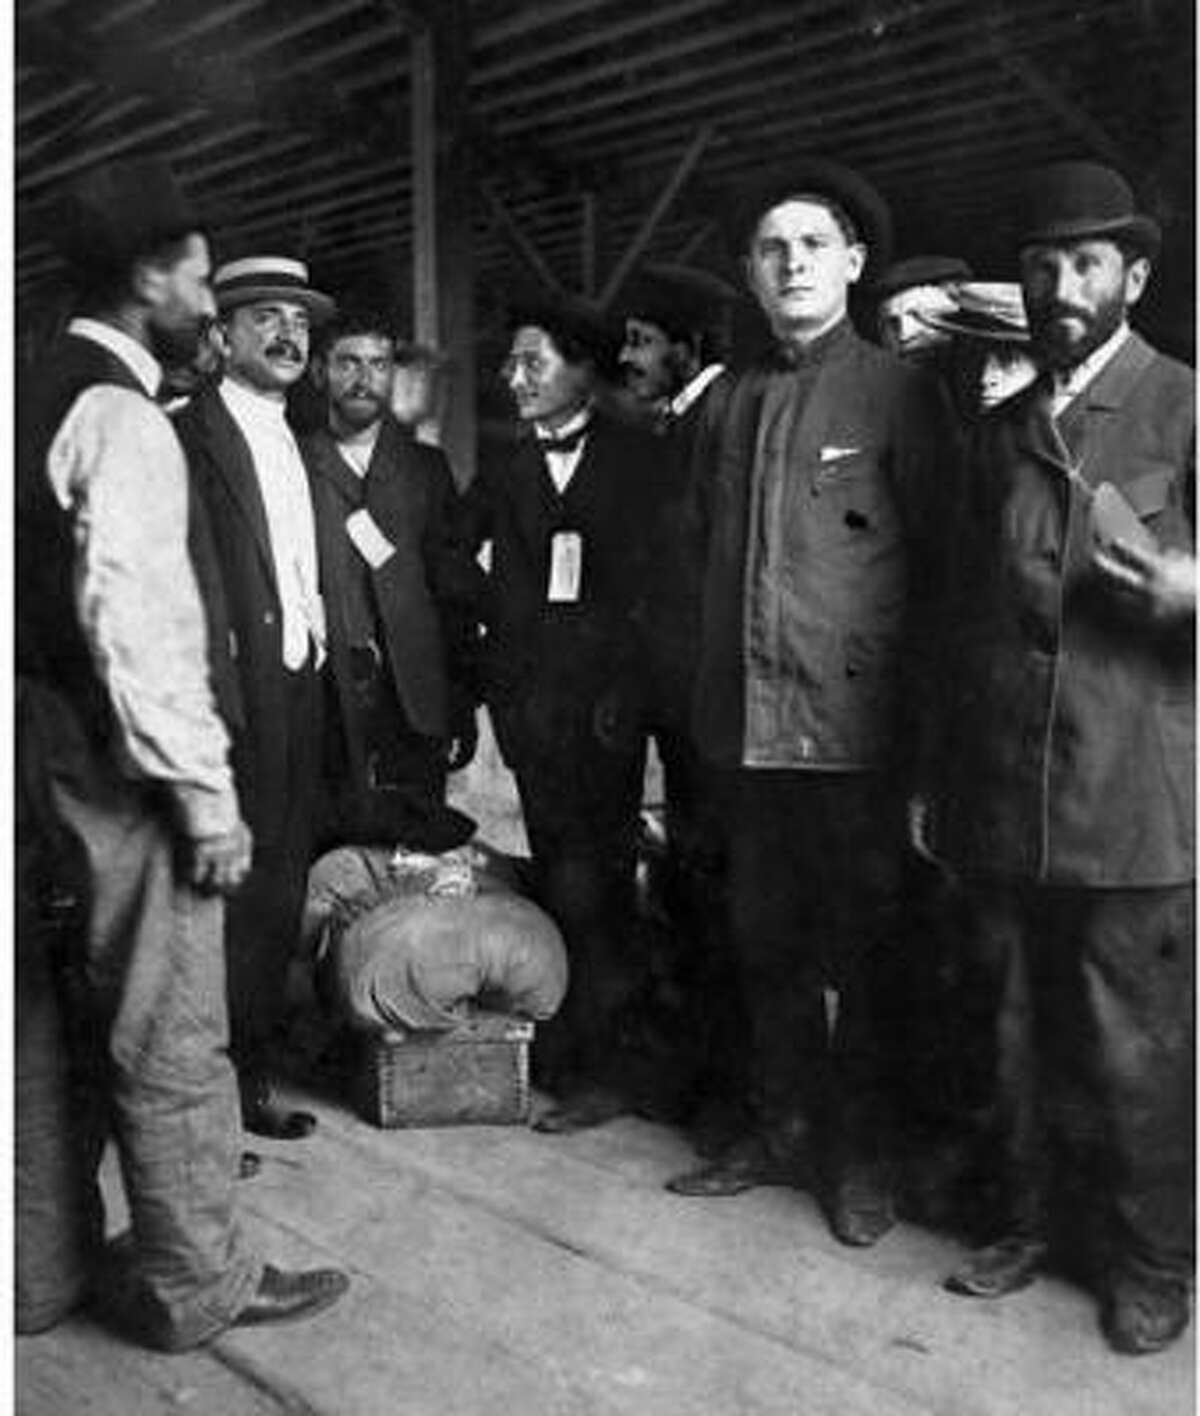 Picture of the Jewish Immigrants in Galveston.